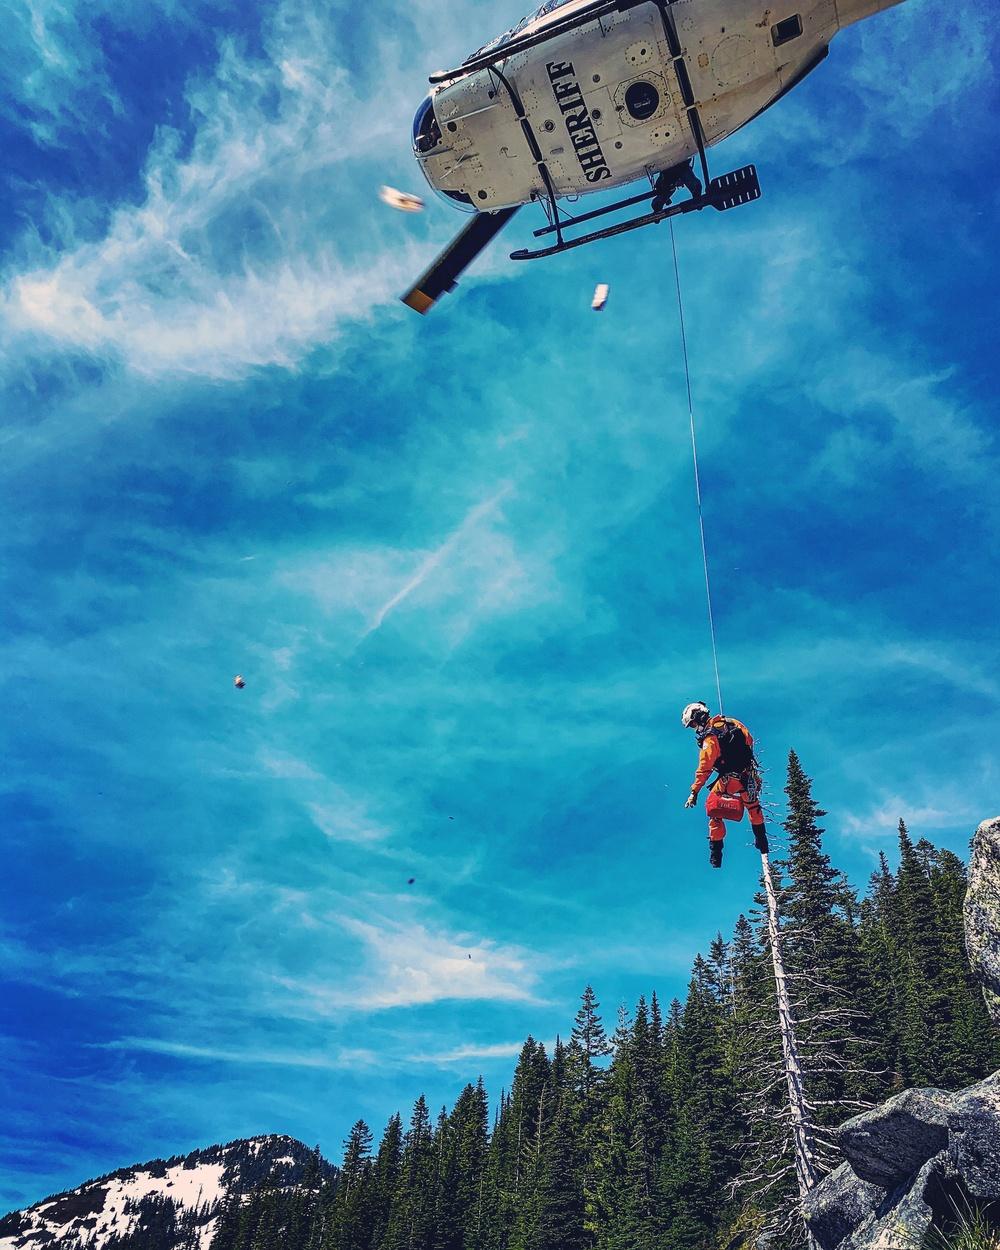 USU Alumni Save Hiker with Cardiac Emergency at 4000 Feet